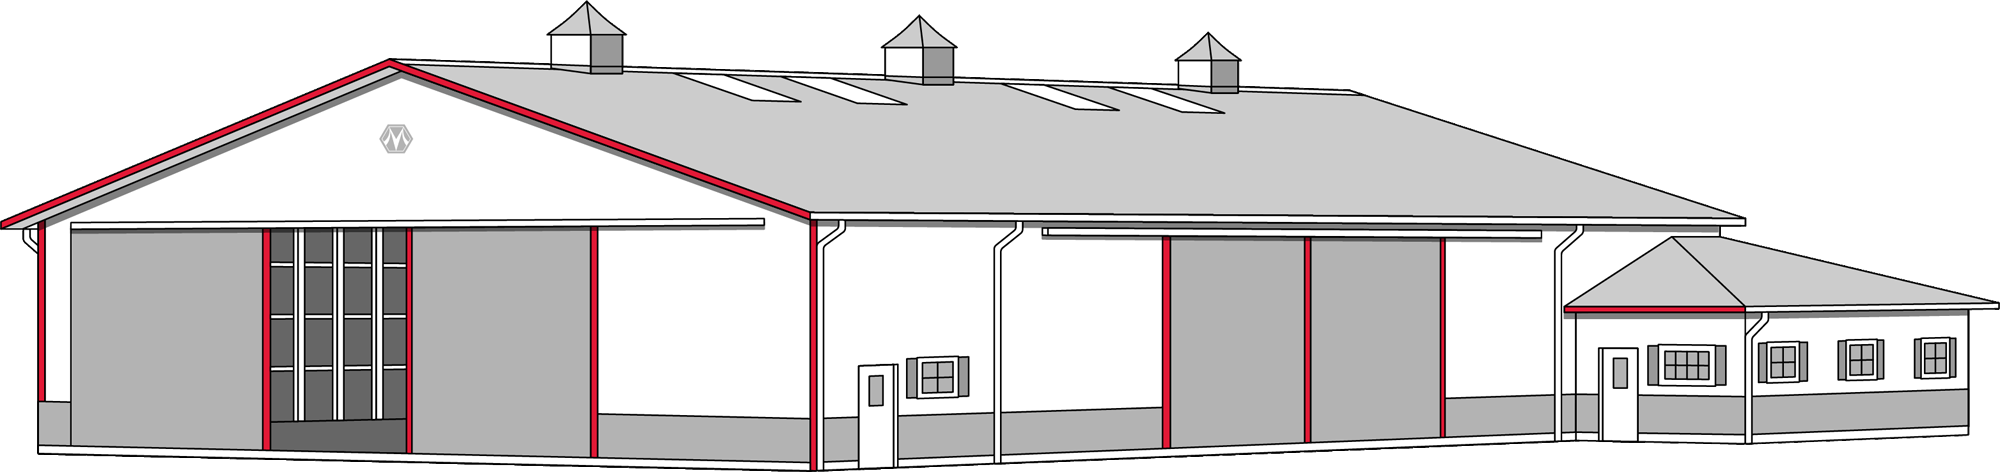 clip black and white download Warehouse clipart pole barn. Repairs morton buildings steel